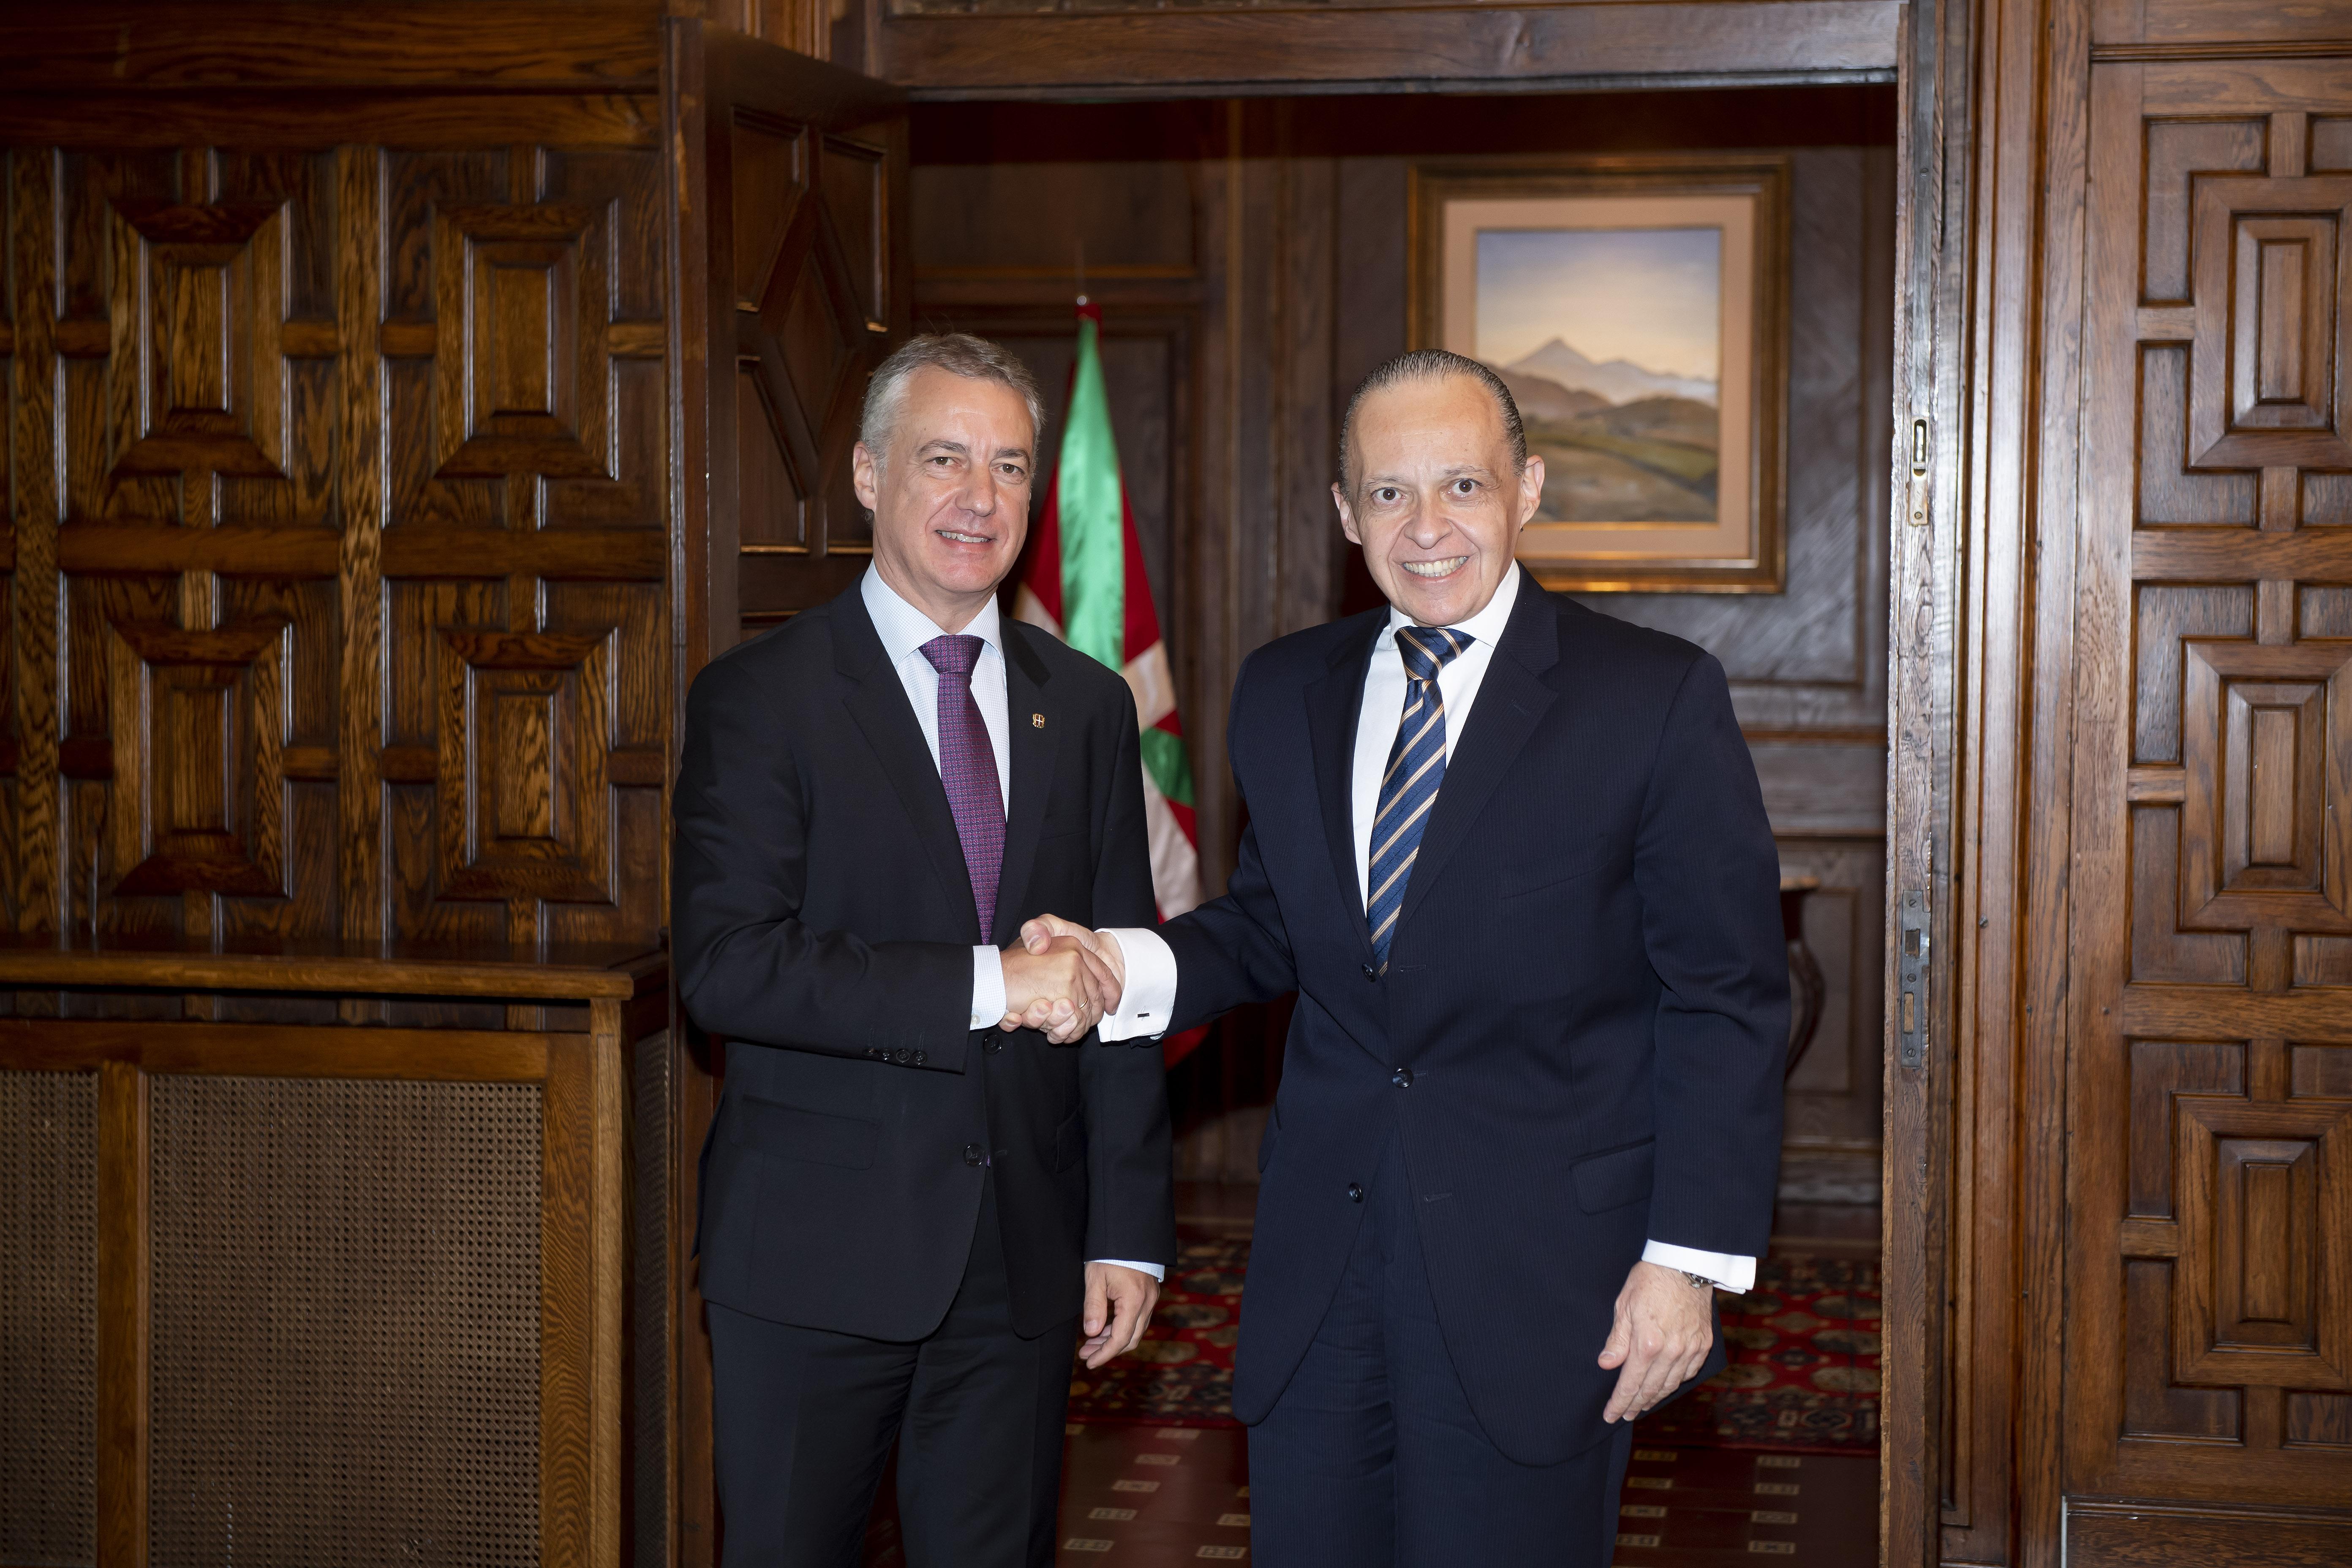 El Lehendakarirecibe al Embajador de Brasil